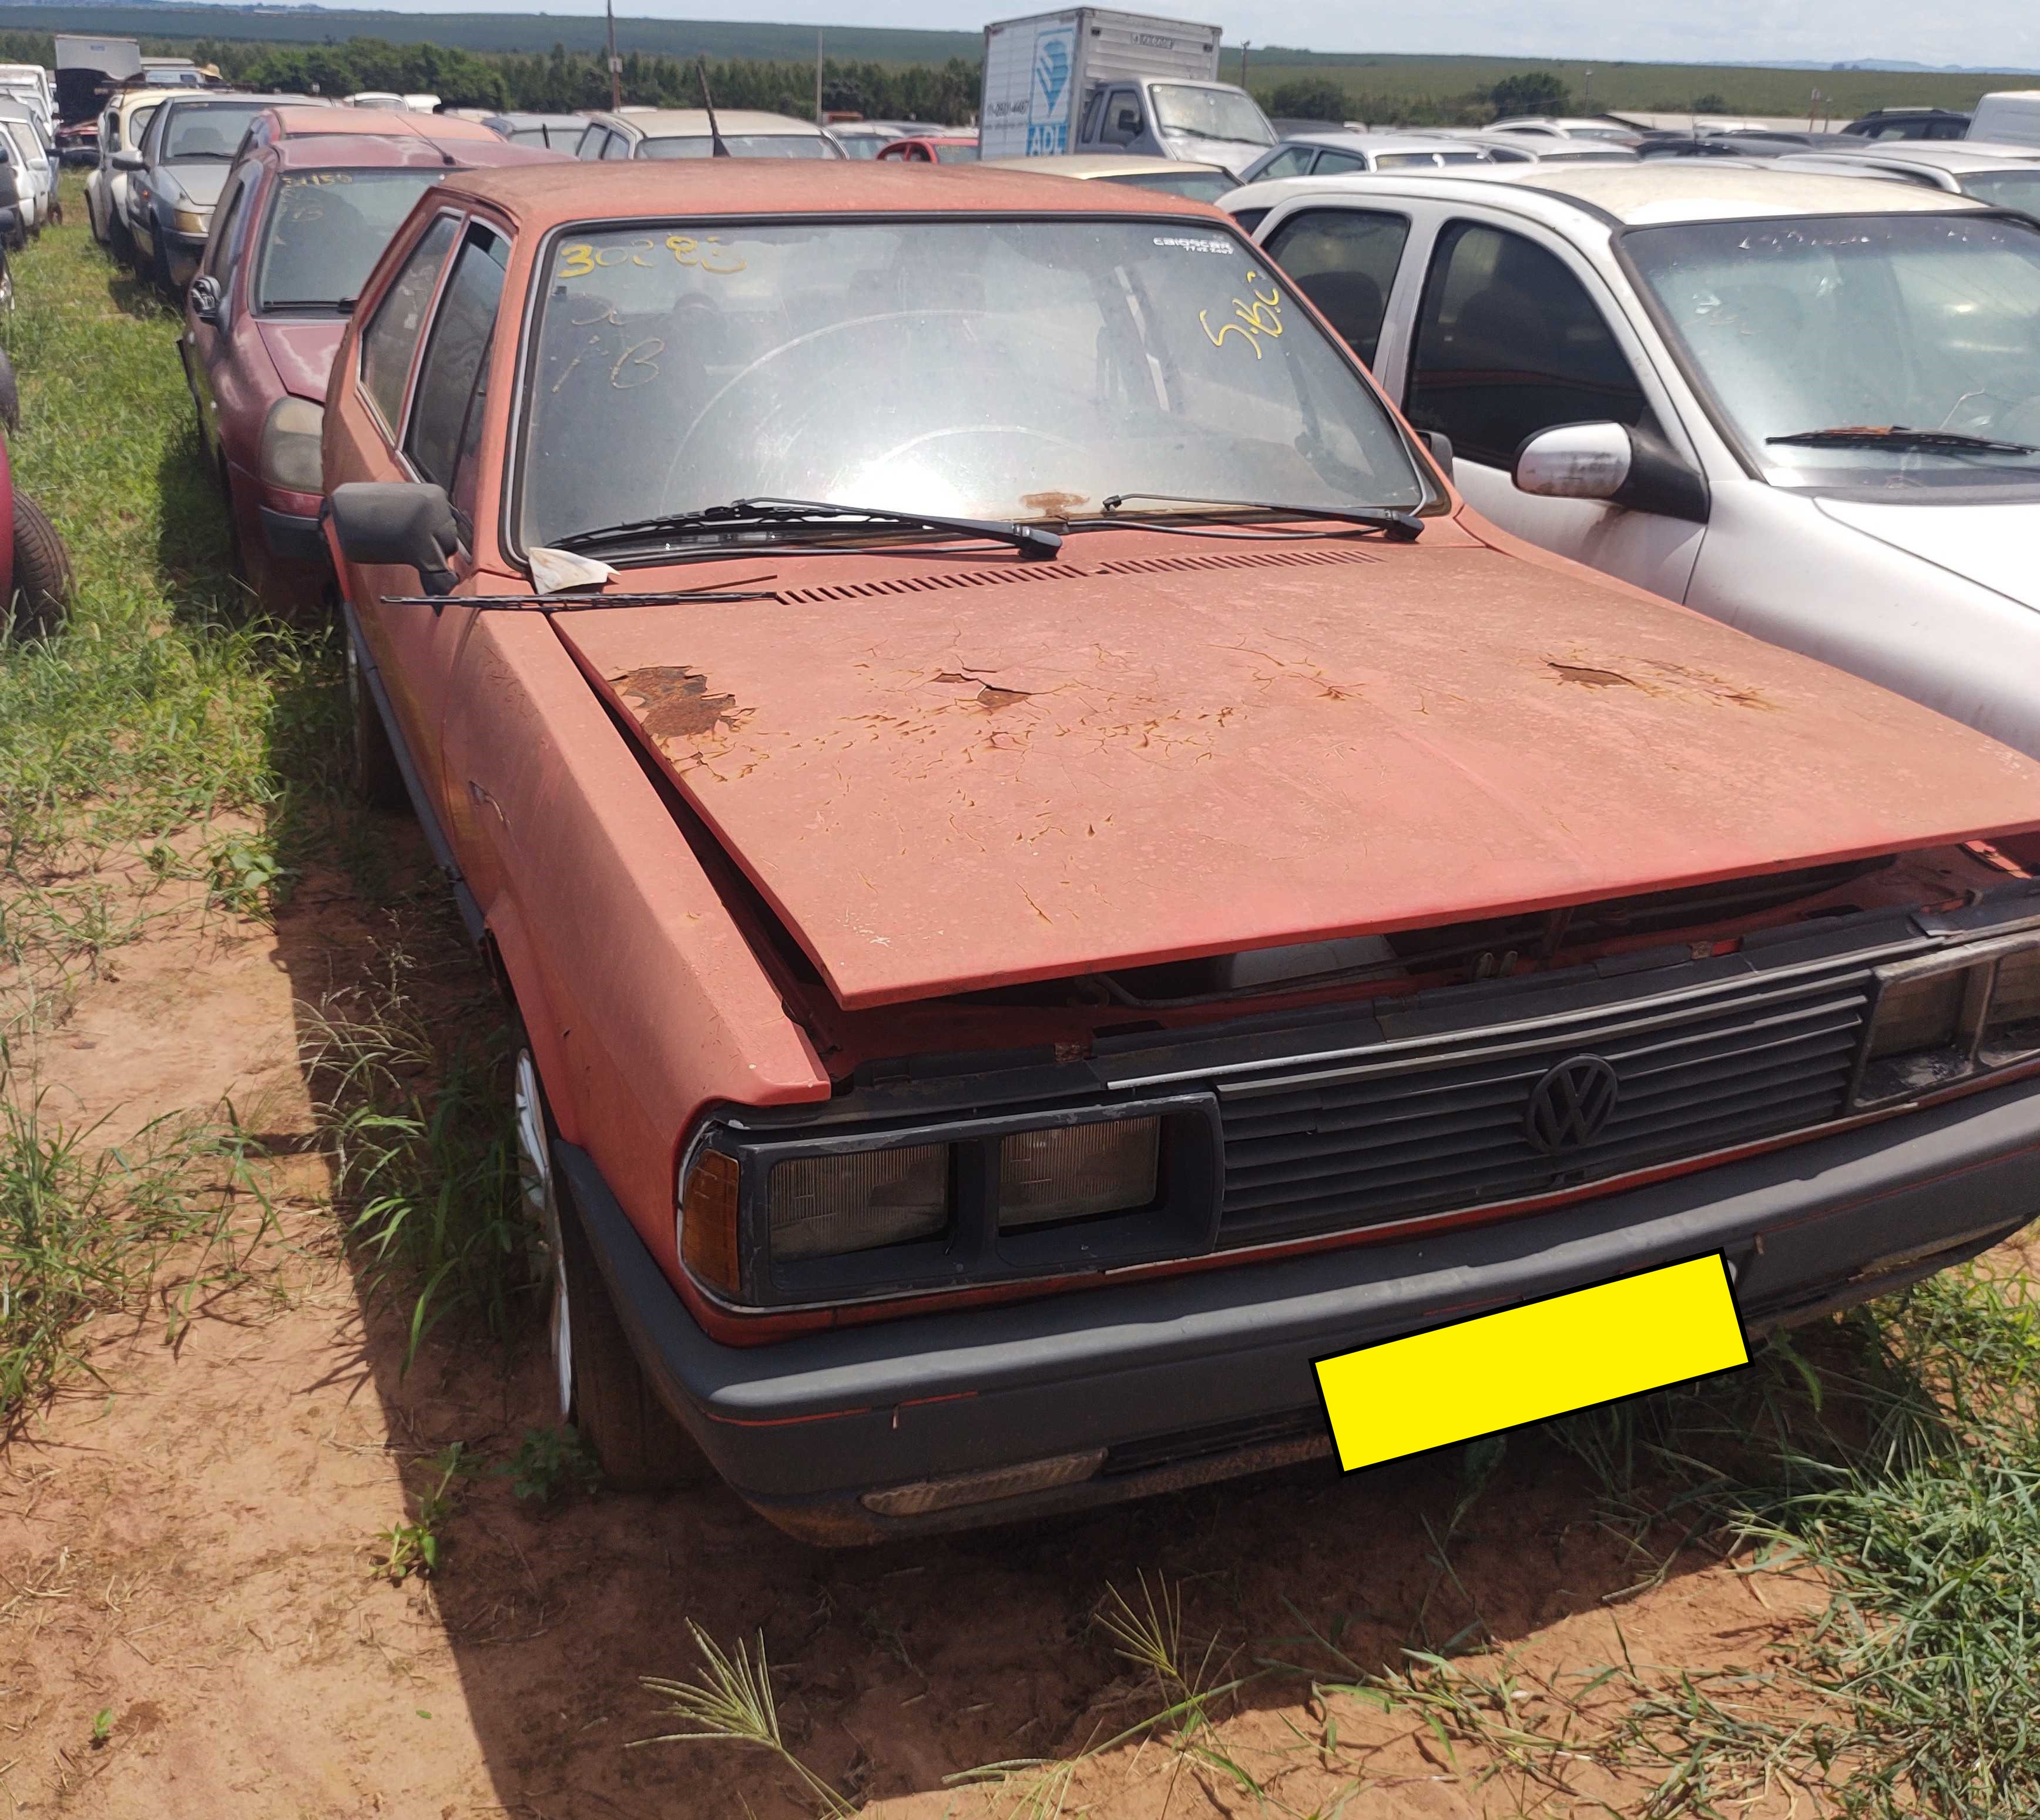 VW/PASSAT GTS - 1985/1986 - Sucata aproveitável motor inservível